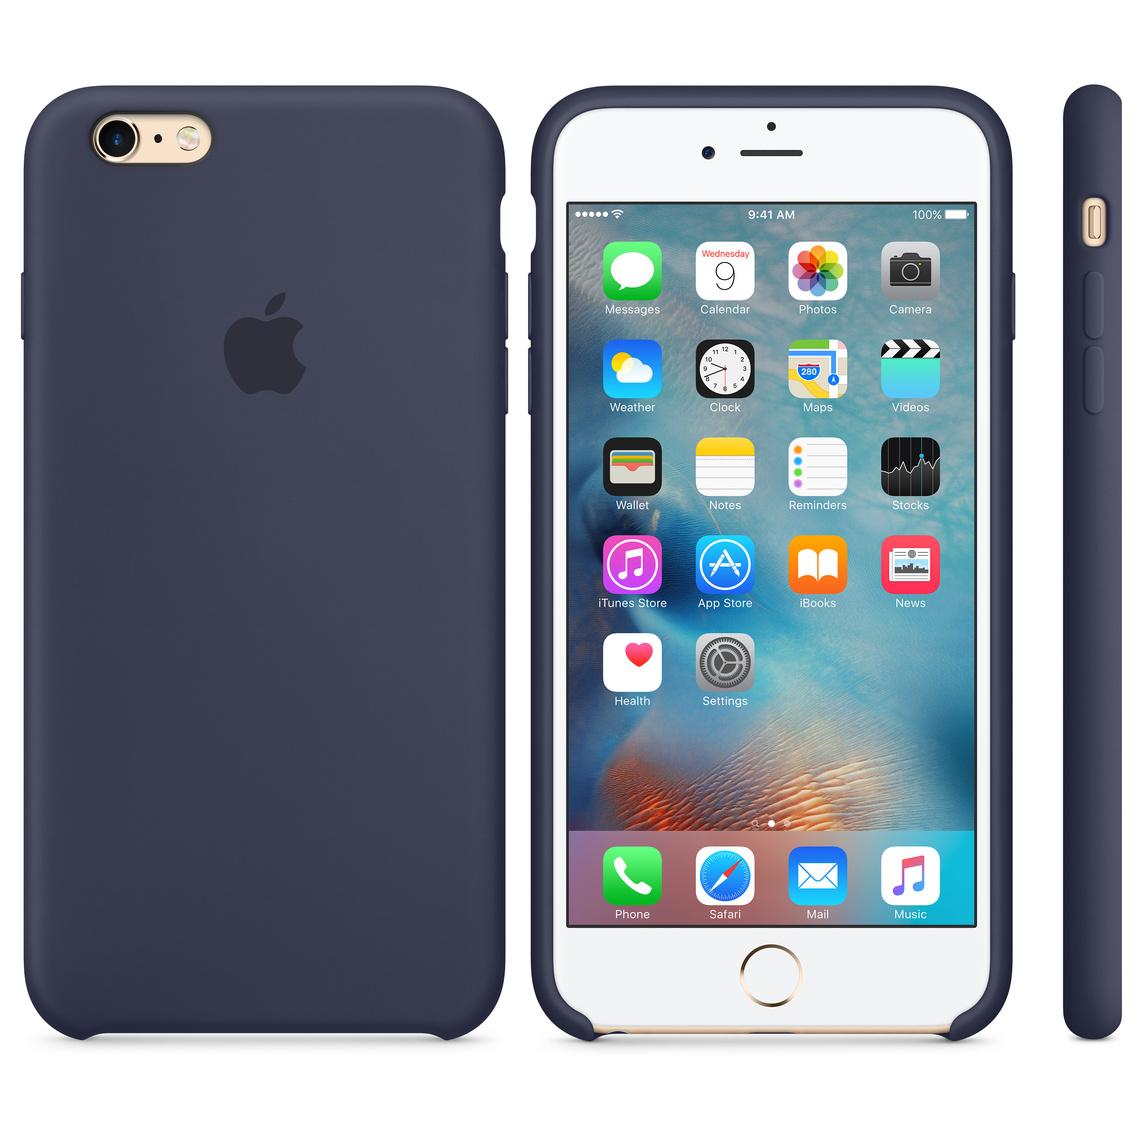 in vendita a1431 39e4f iPhone 6 Plus / 6s Plus Silicone Case - Midnight Blue